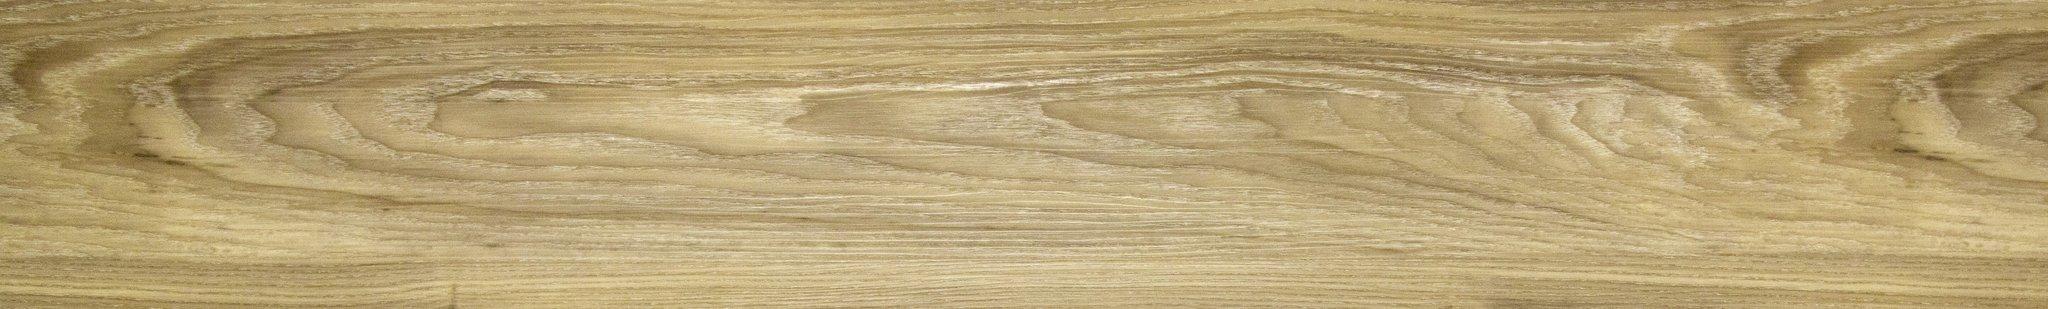 Виниловый ламинат Alpine Floor - Ultra Дуб CREO